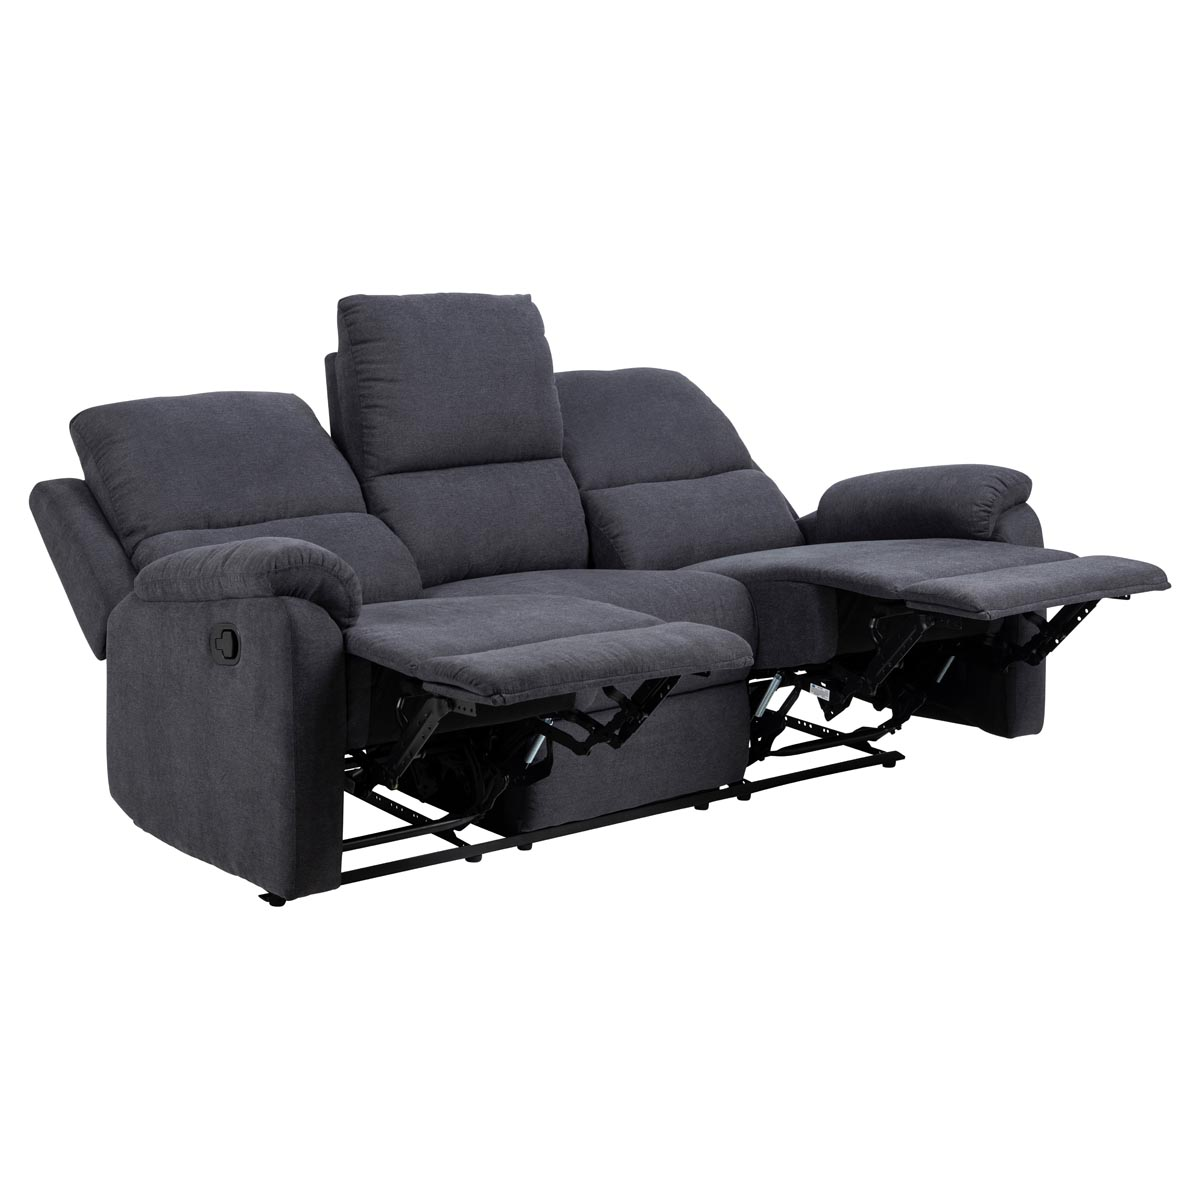 Smogen-3sits-recliner-vololage2